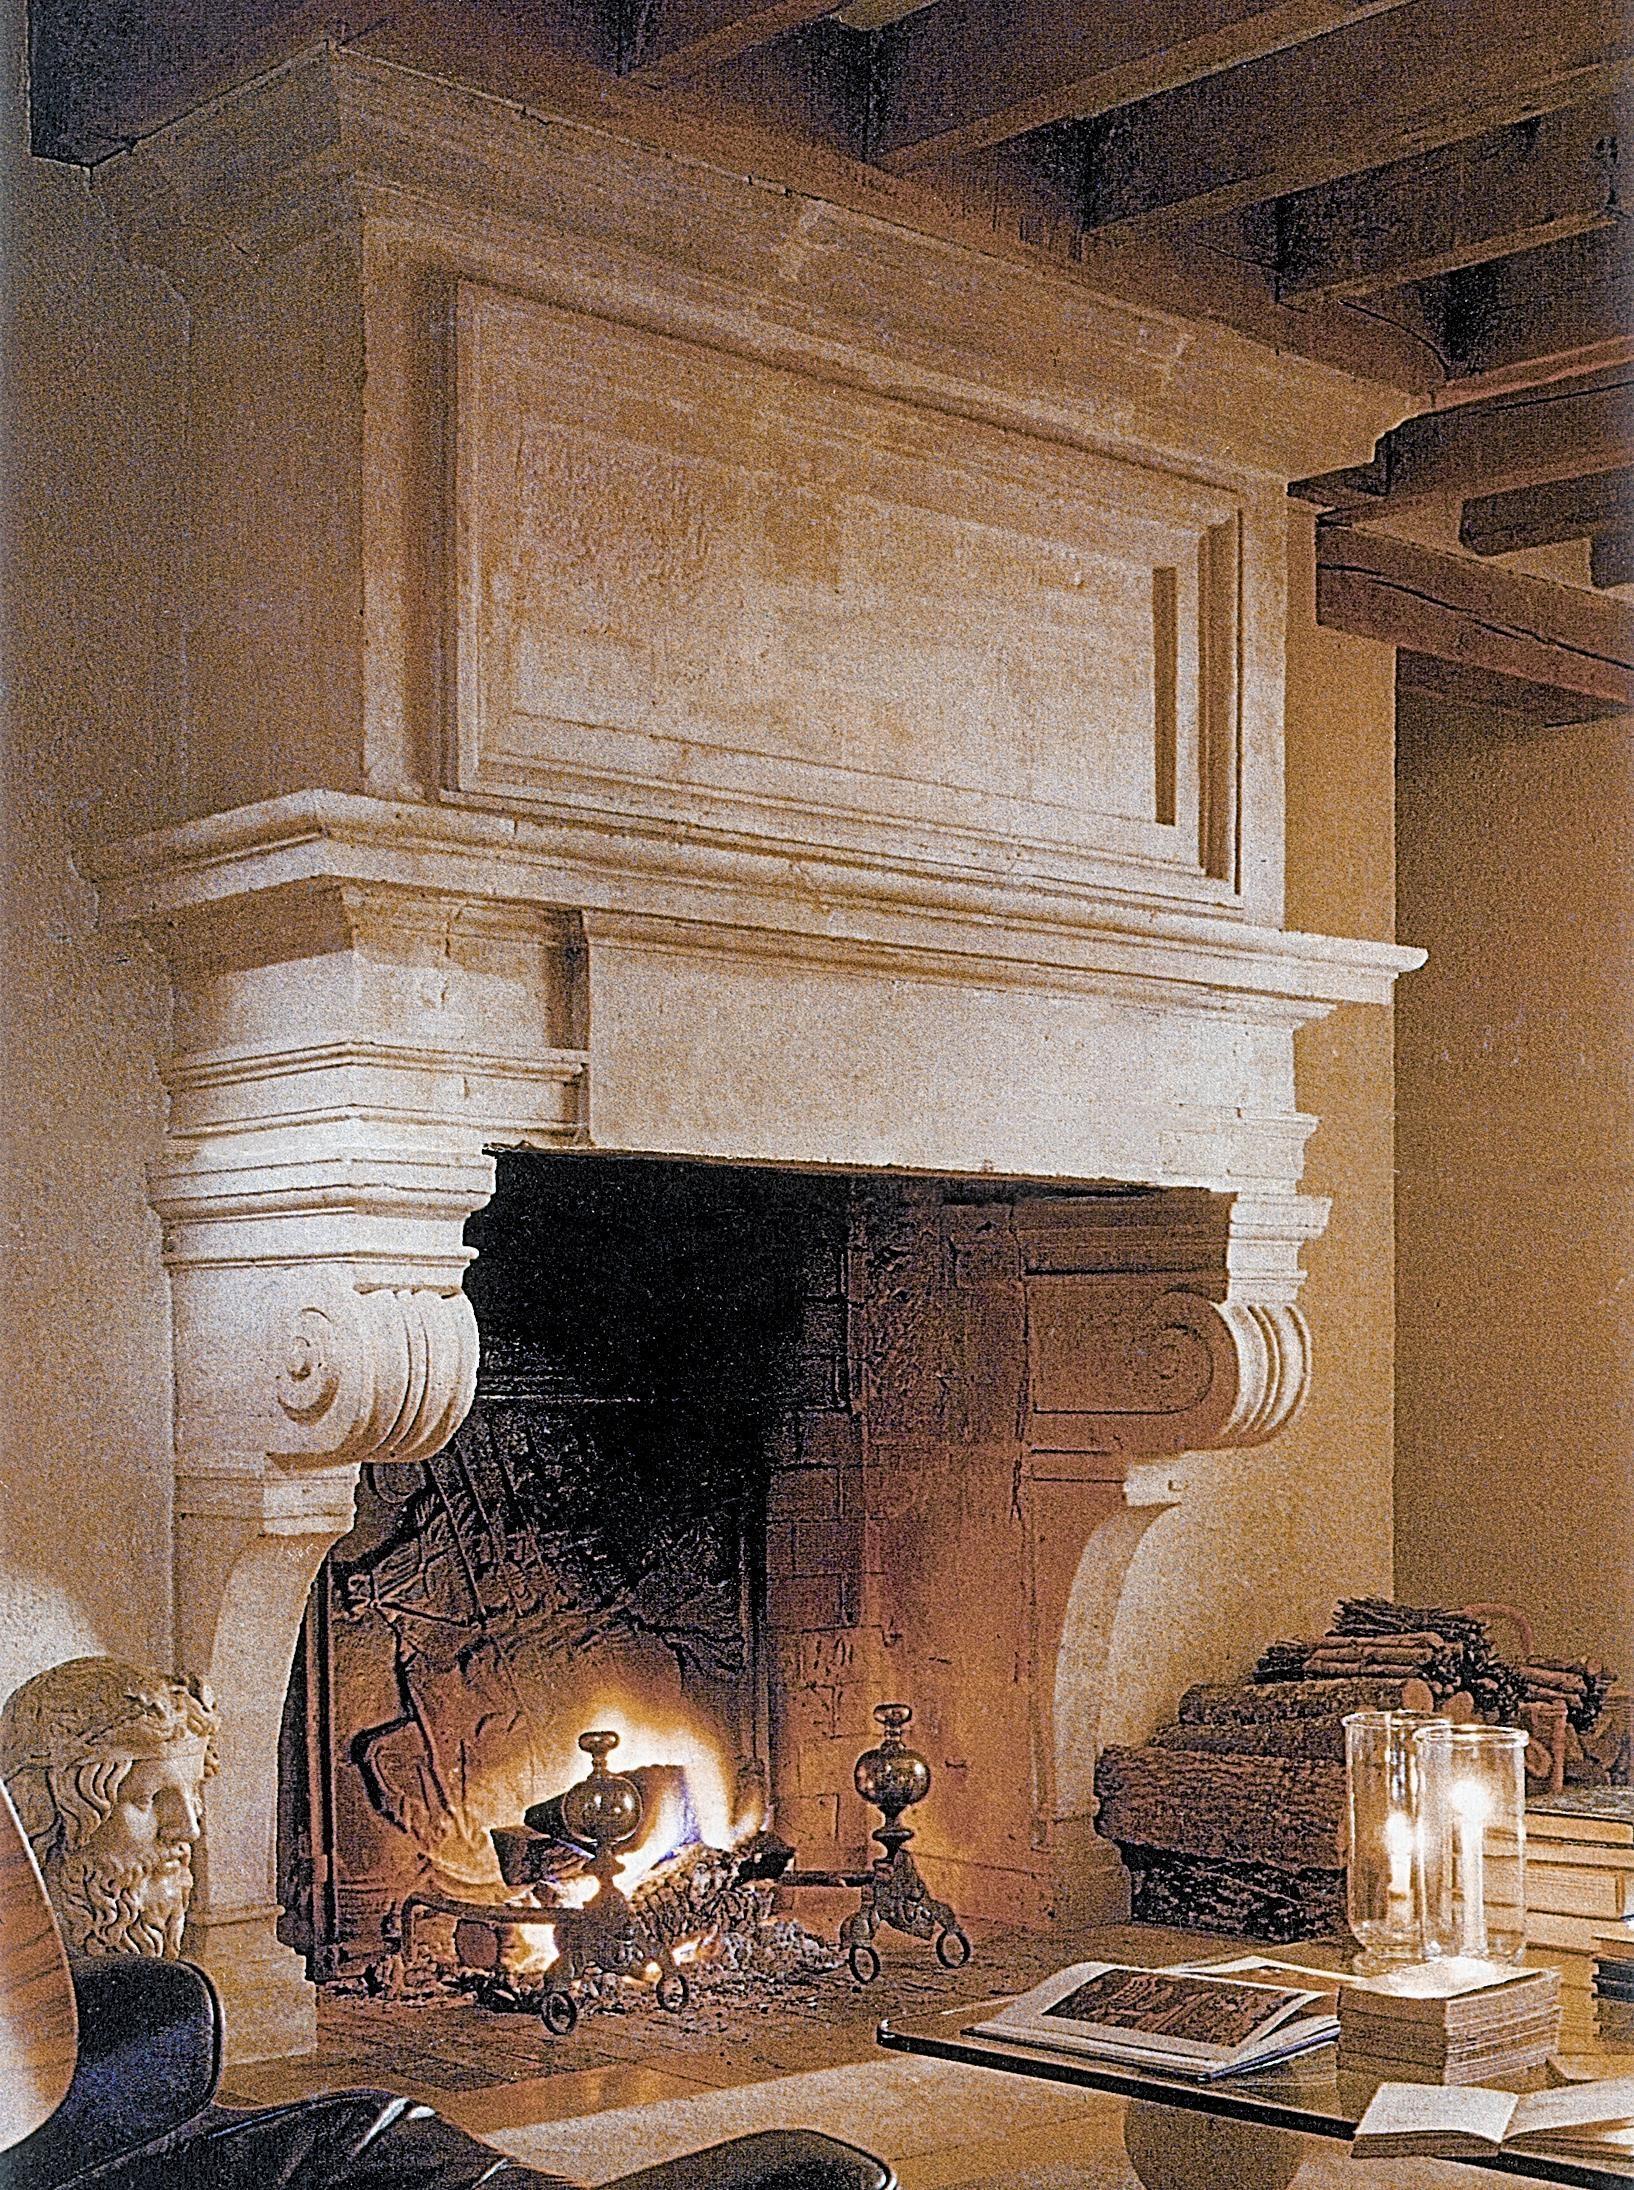 Stone Age Designs' Fireplace Mantels Recreate An Italian In Italian Stone Wall Art (Image 18 of 20)